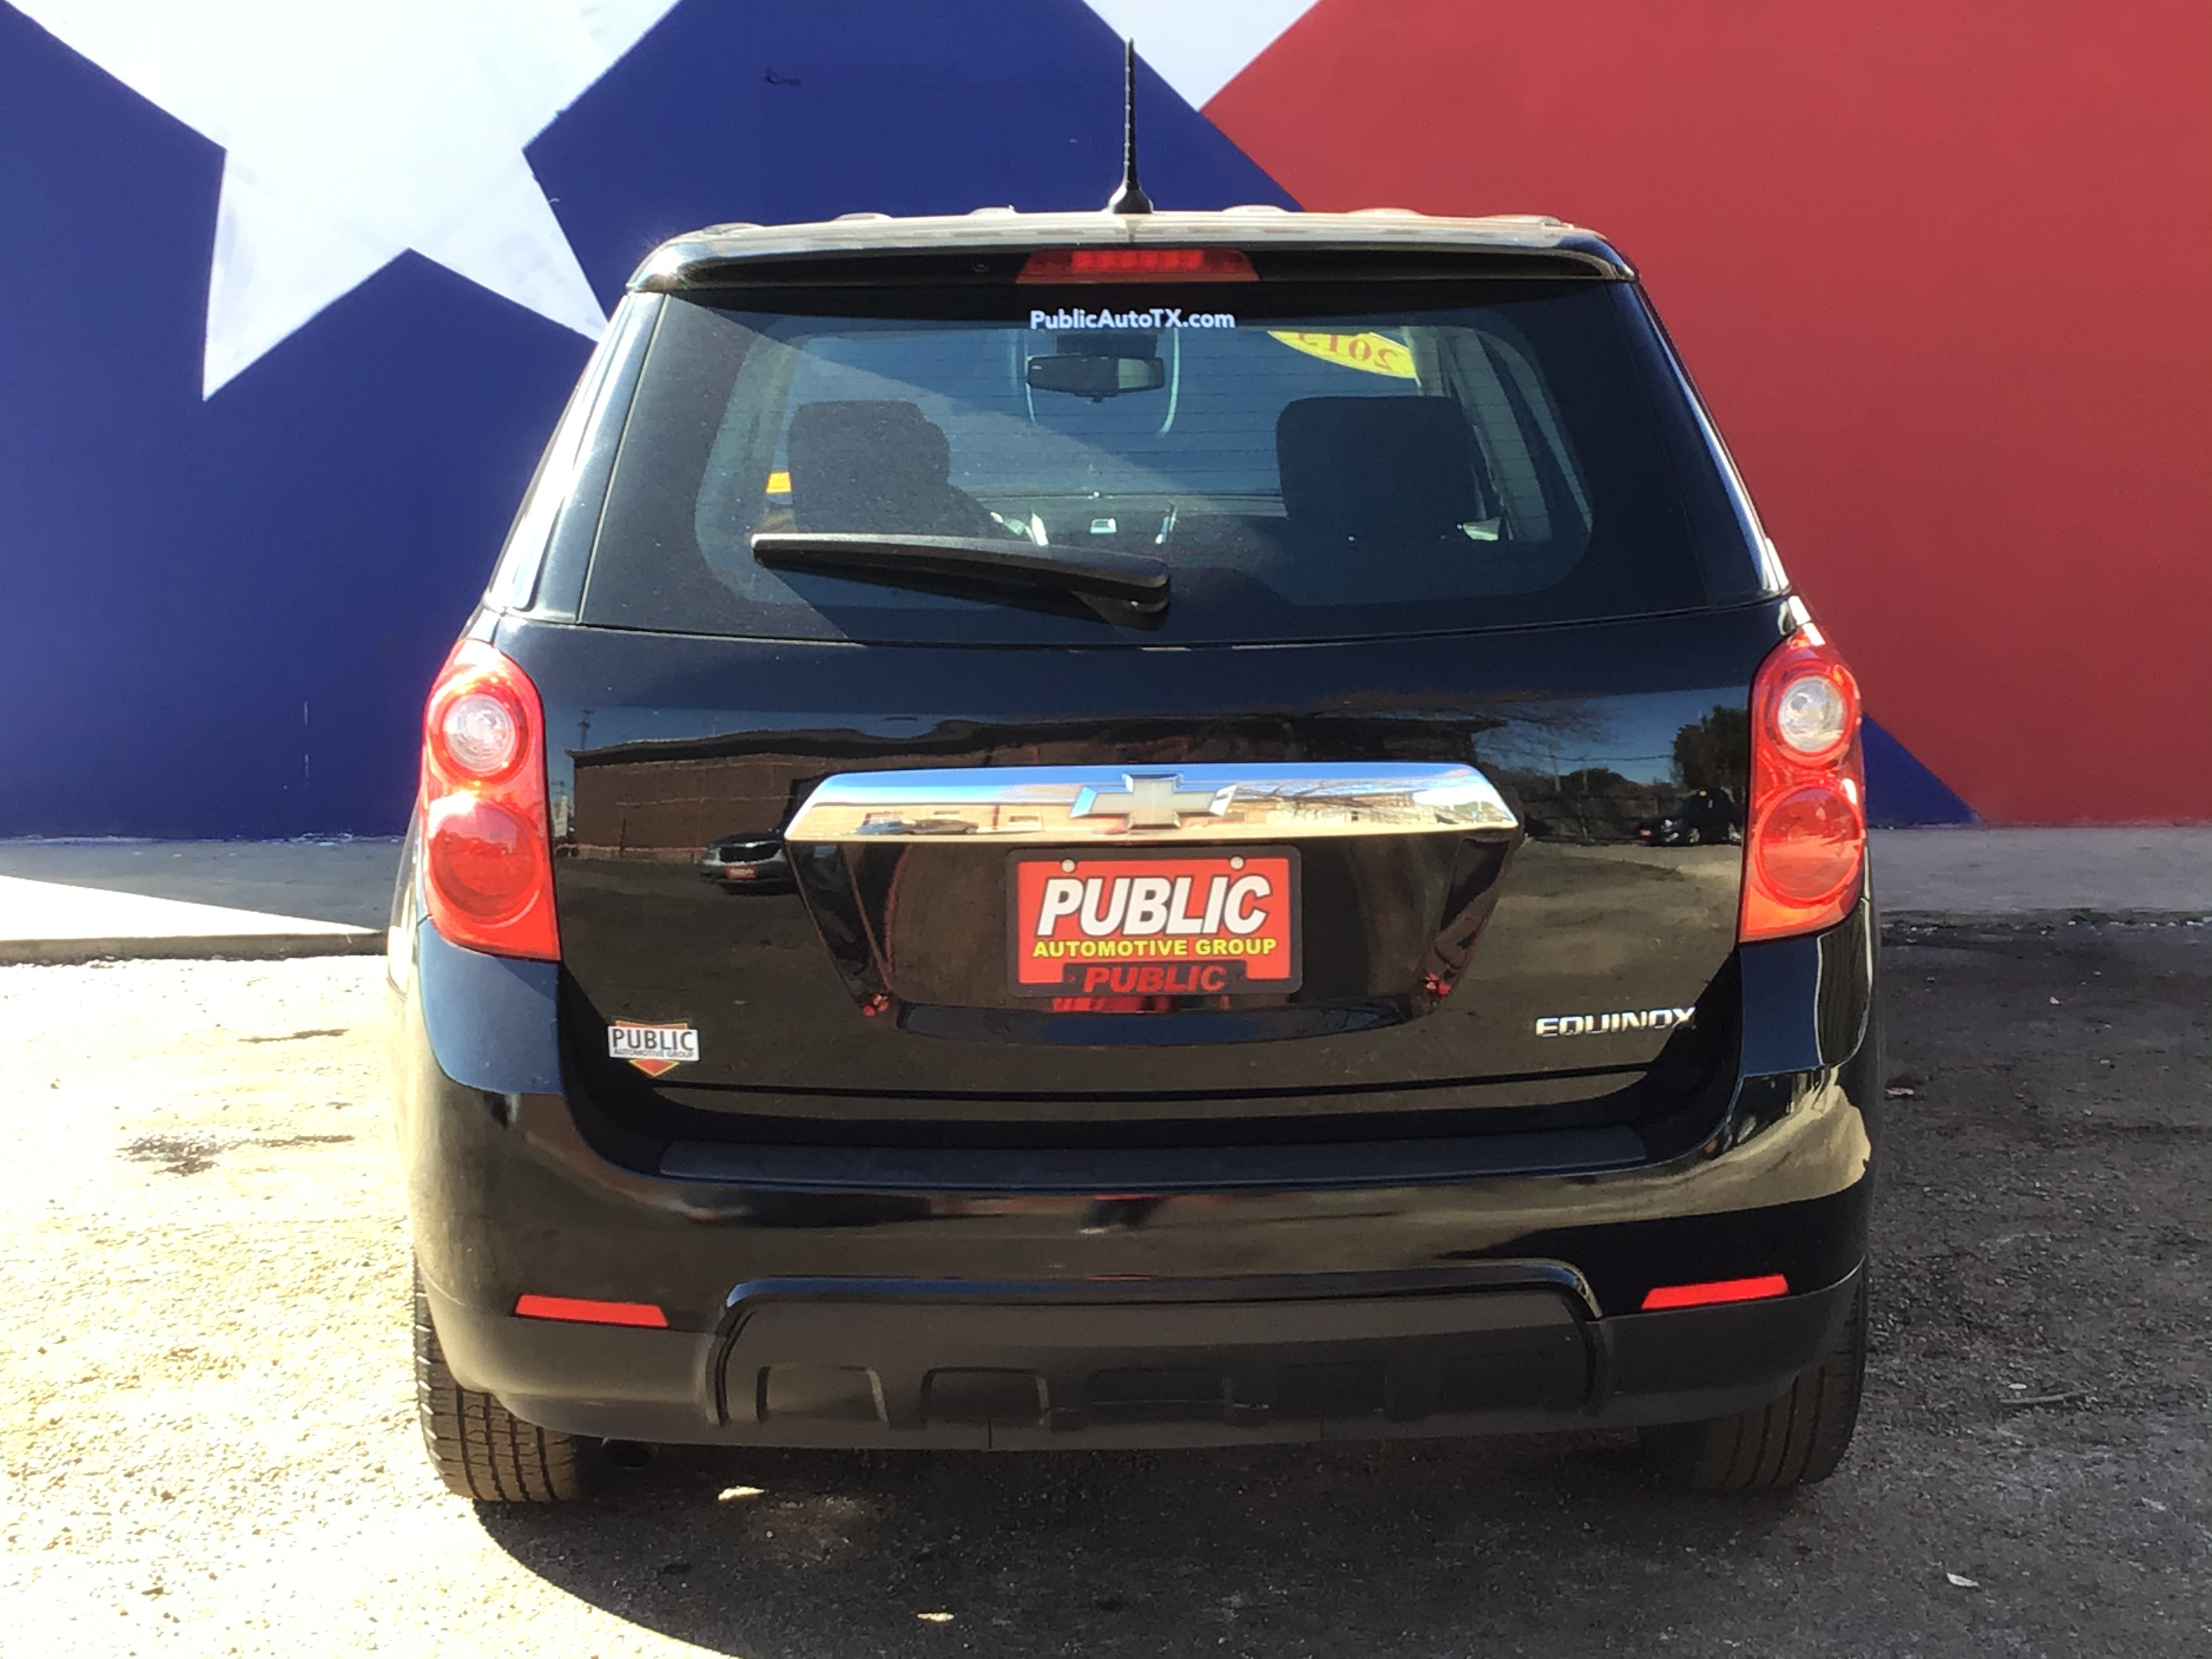 used vehicle - SUV CHEVROLET EQUINOX 2013